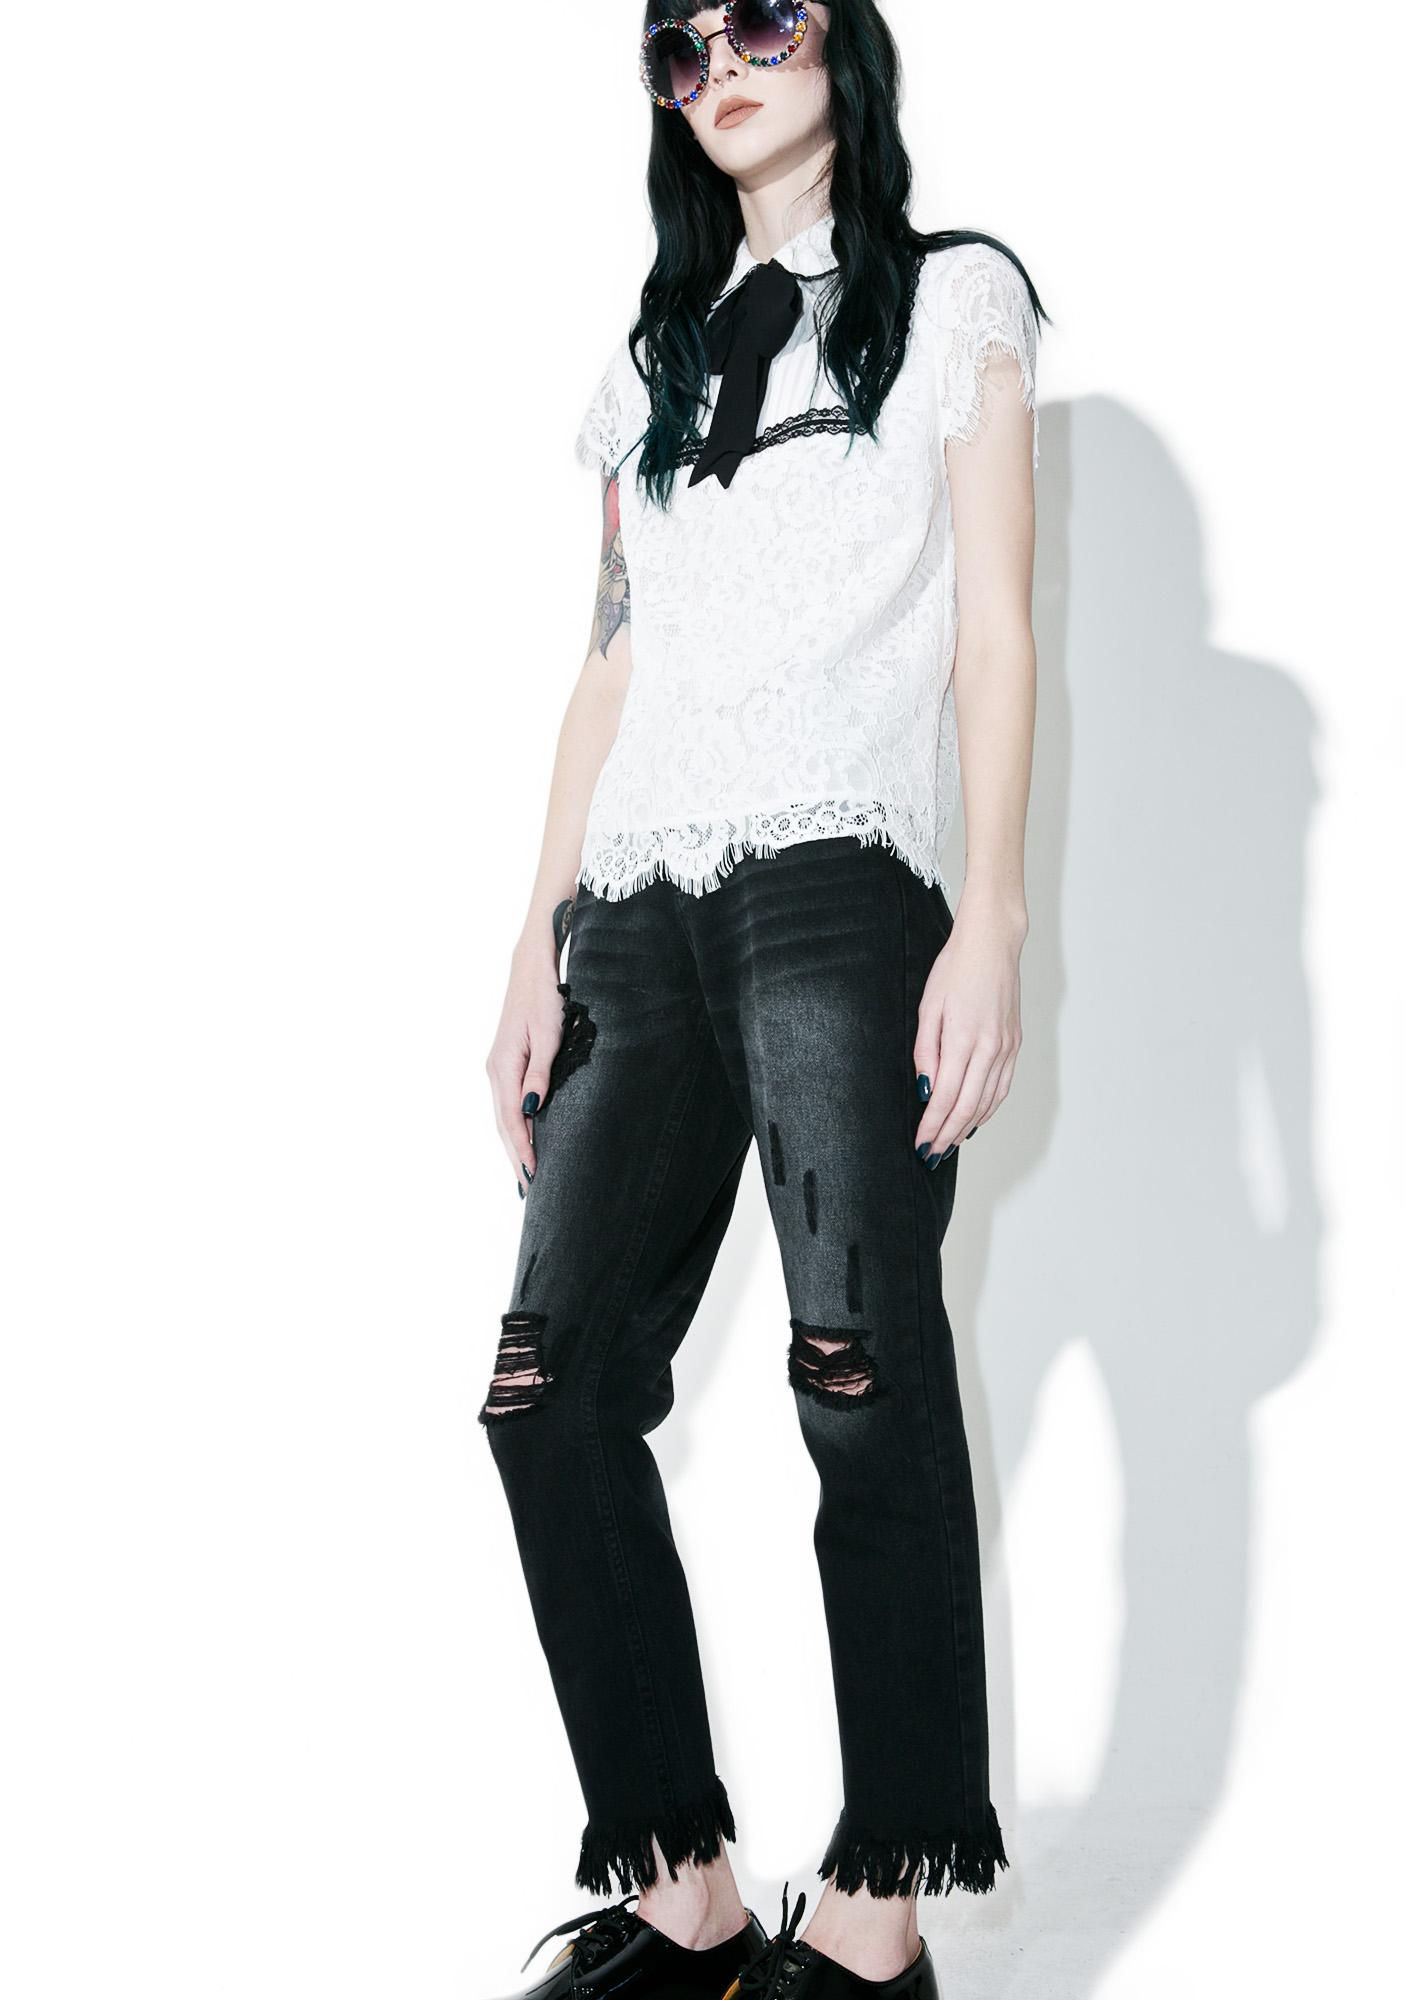 Tattle Tailz Distressed Jeans